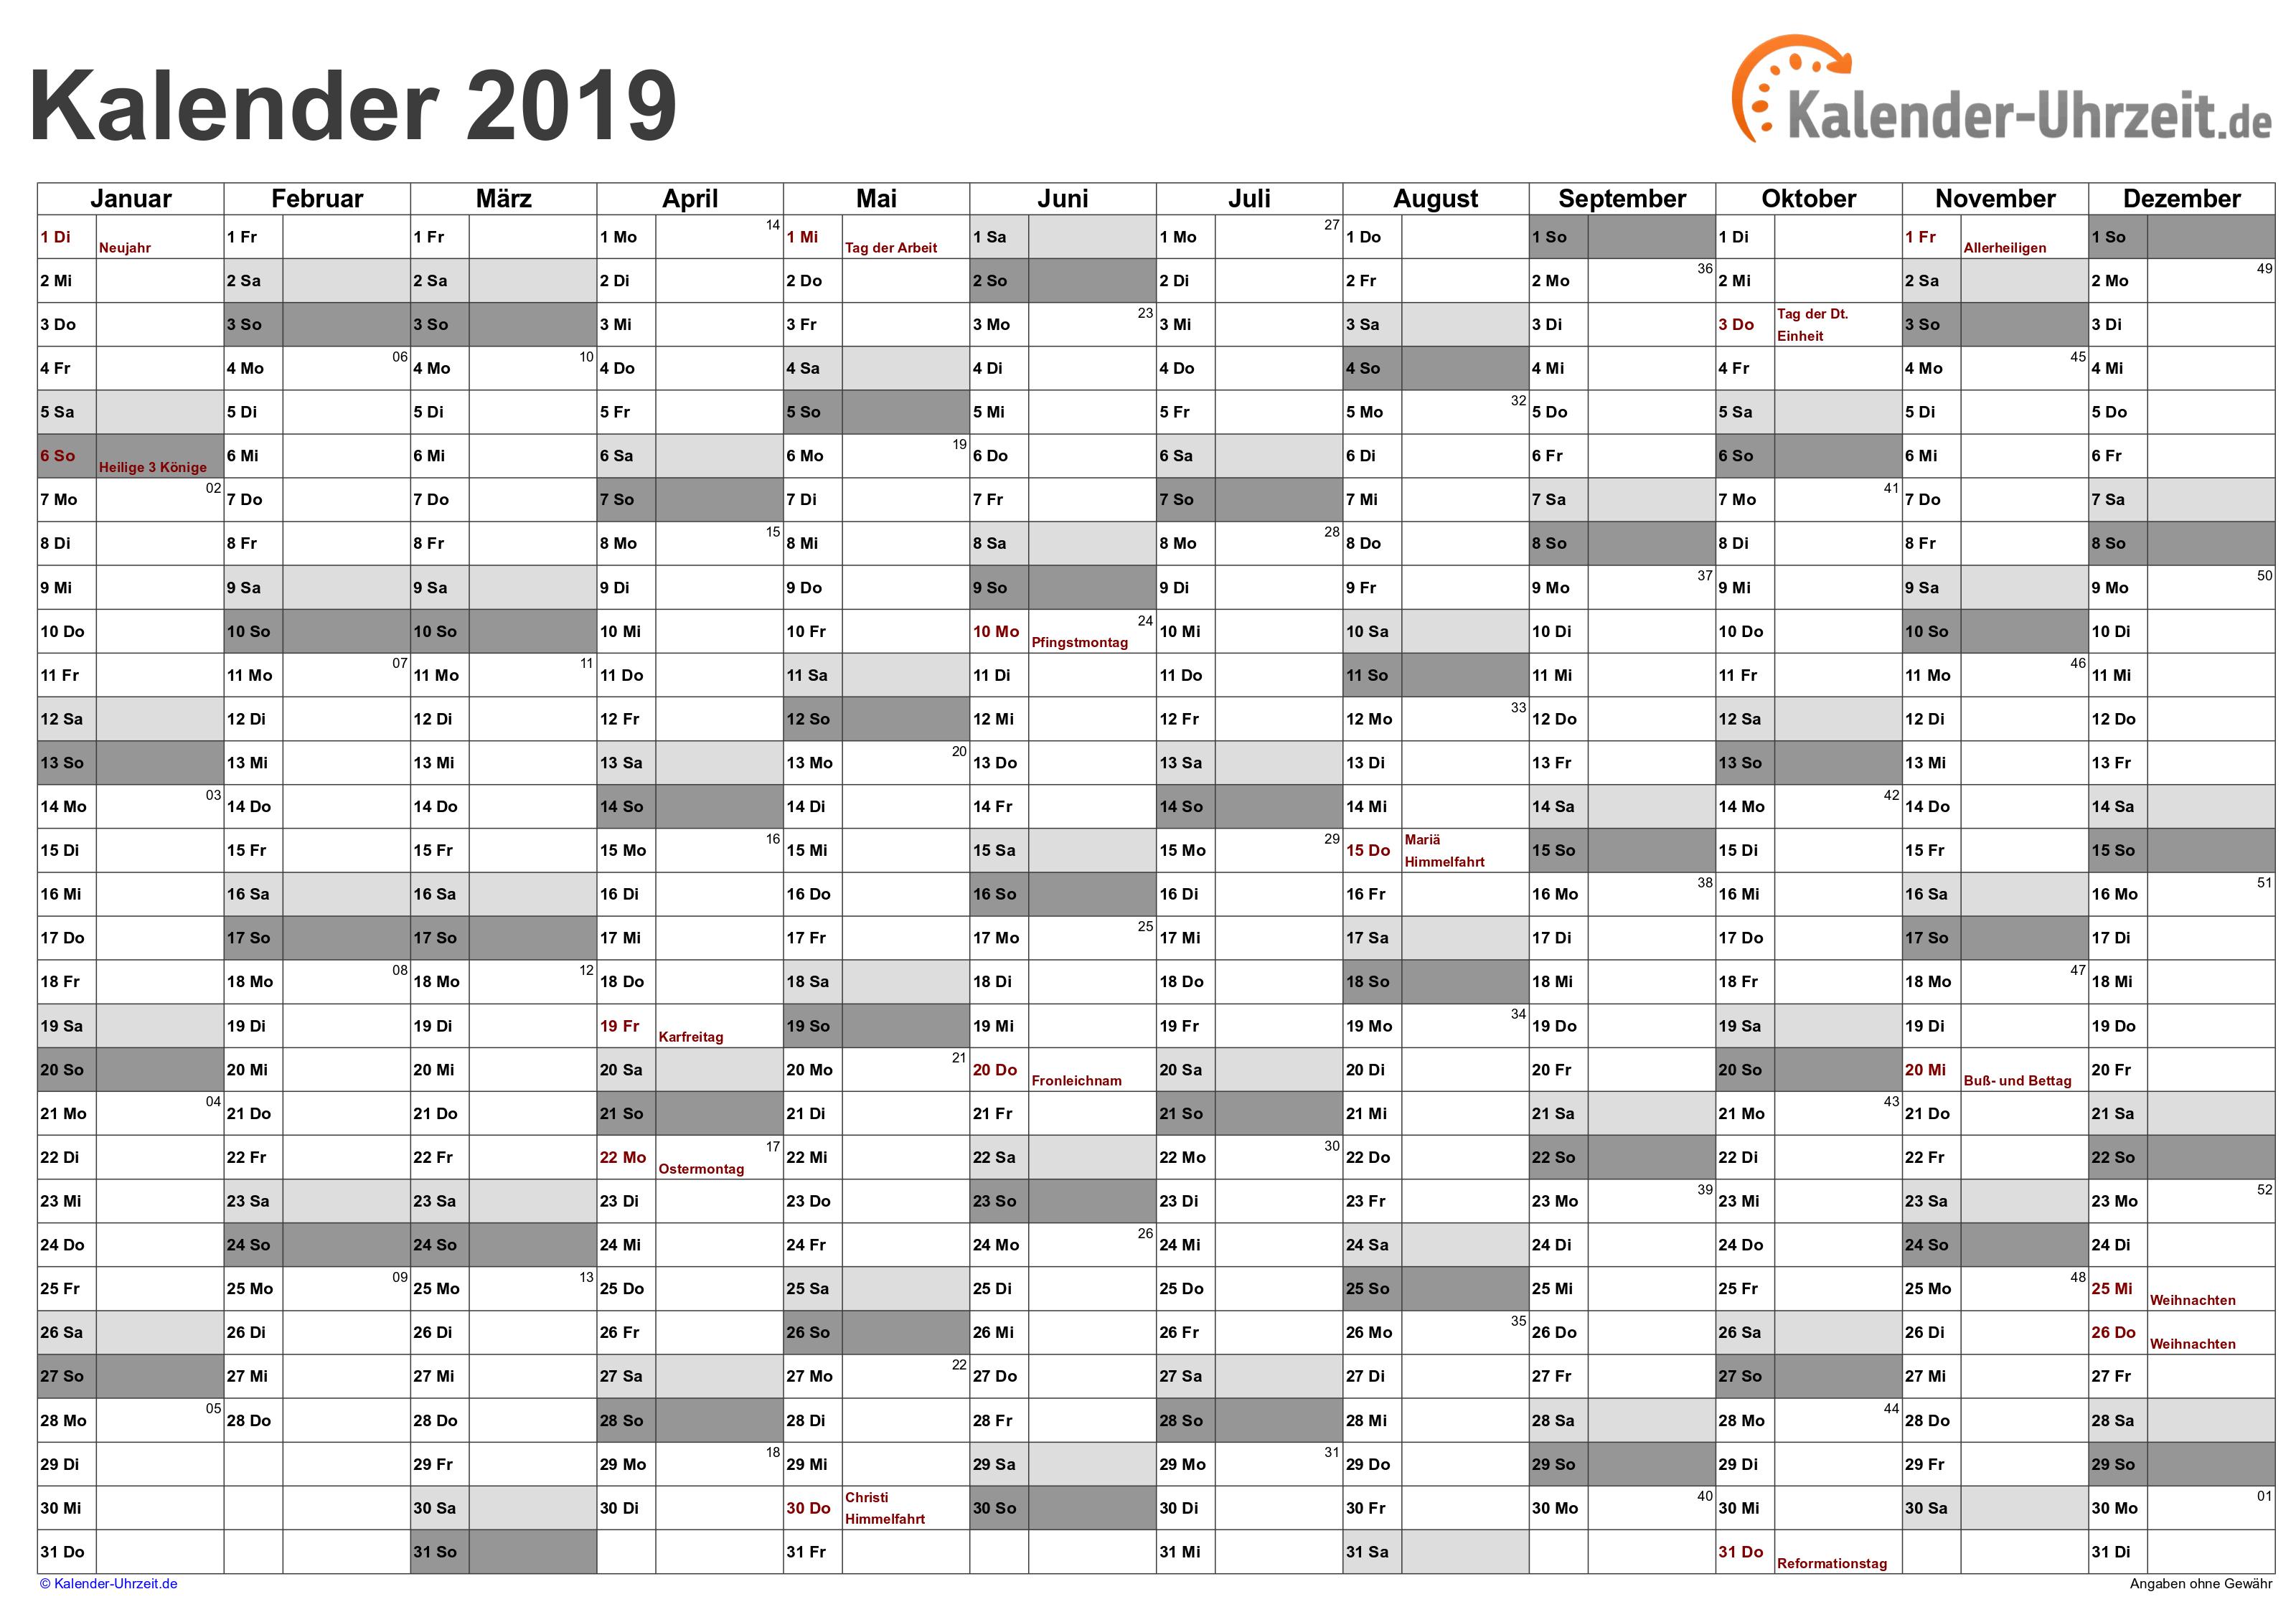 EXCEL-KALENDER 2019 - KOSTENLOS